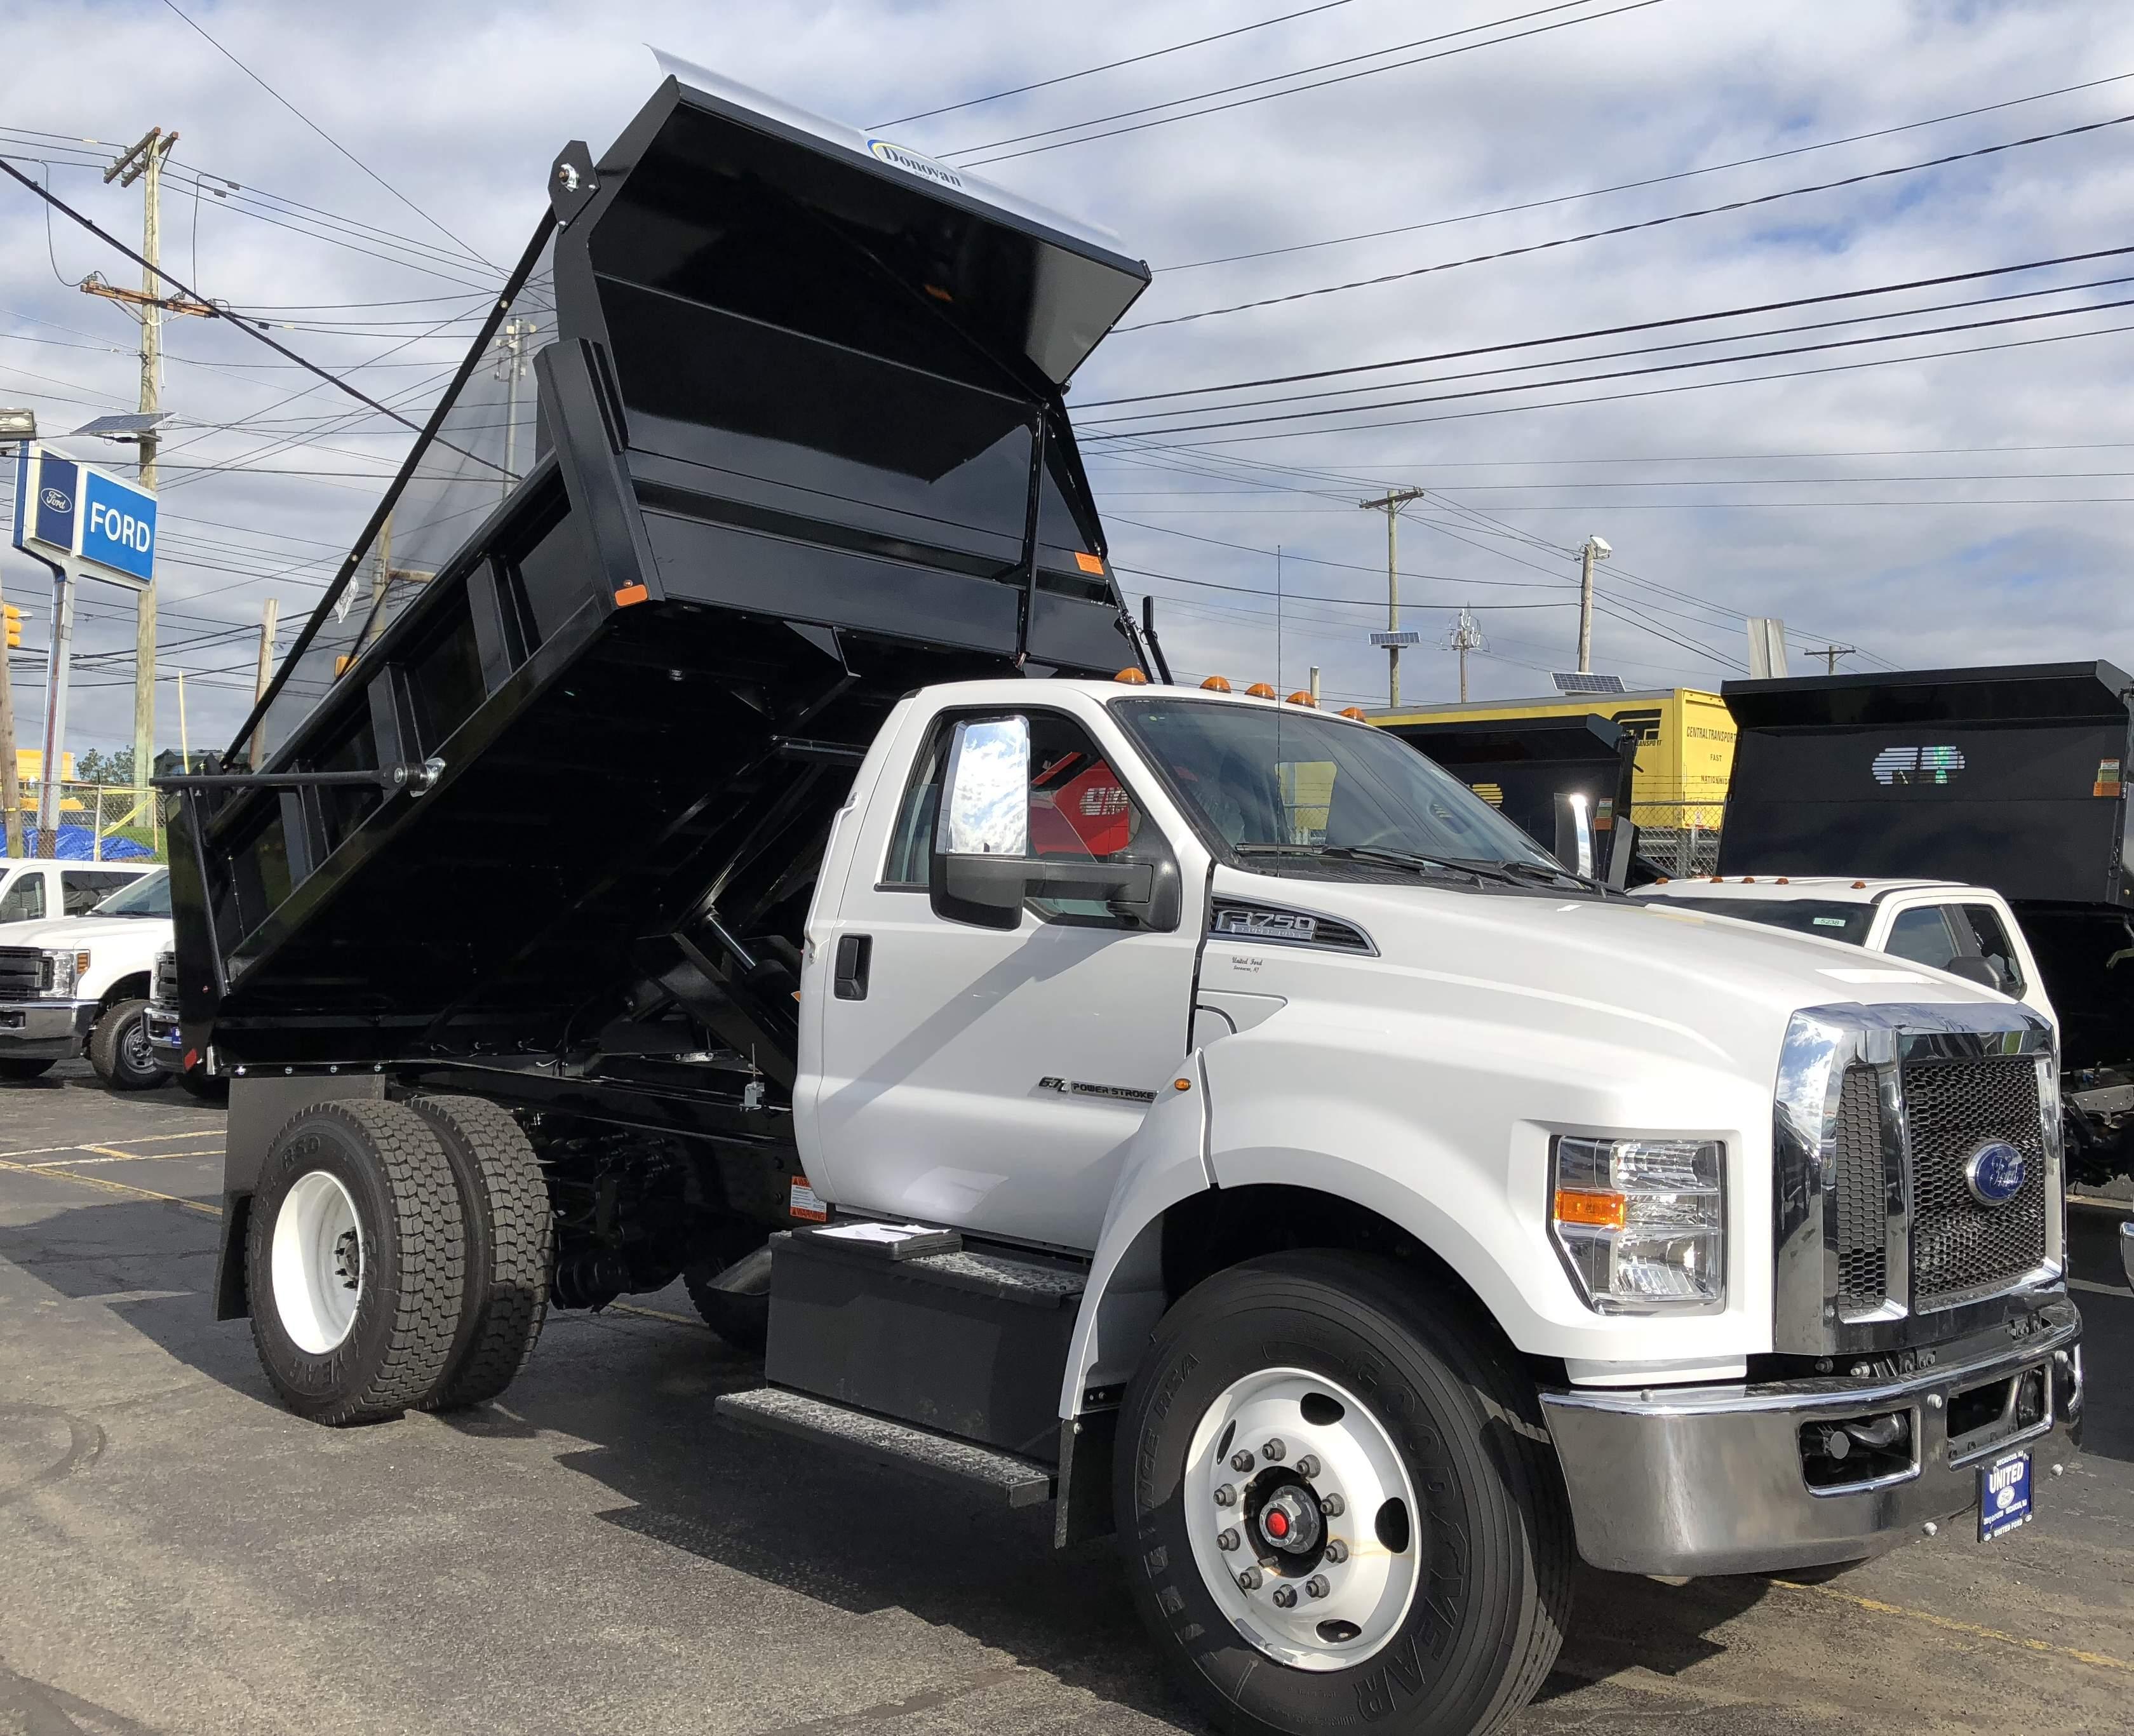 2019 Ford F-650-750 F-750 SD Diesel Straight Frame Dump Truck